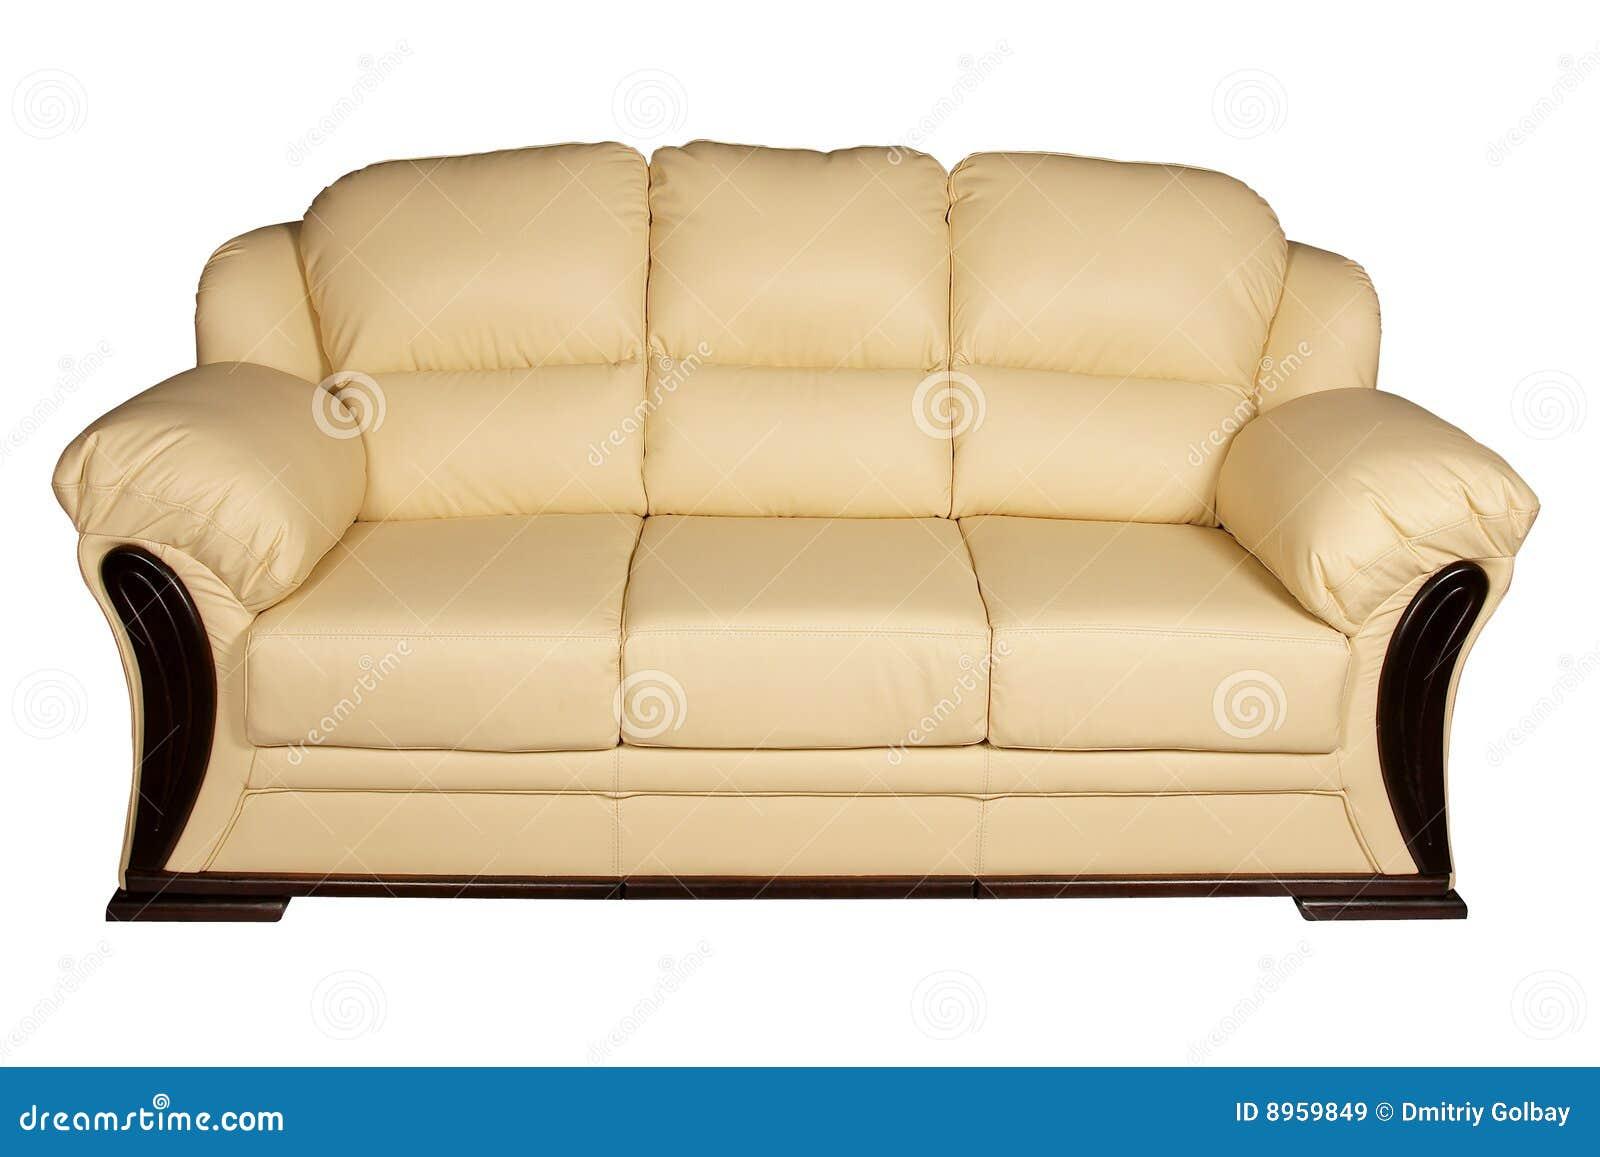 Cream Leather Sofa Royalty Free Stock Images Image 8959849